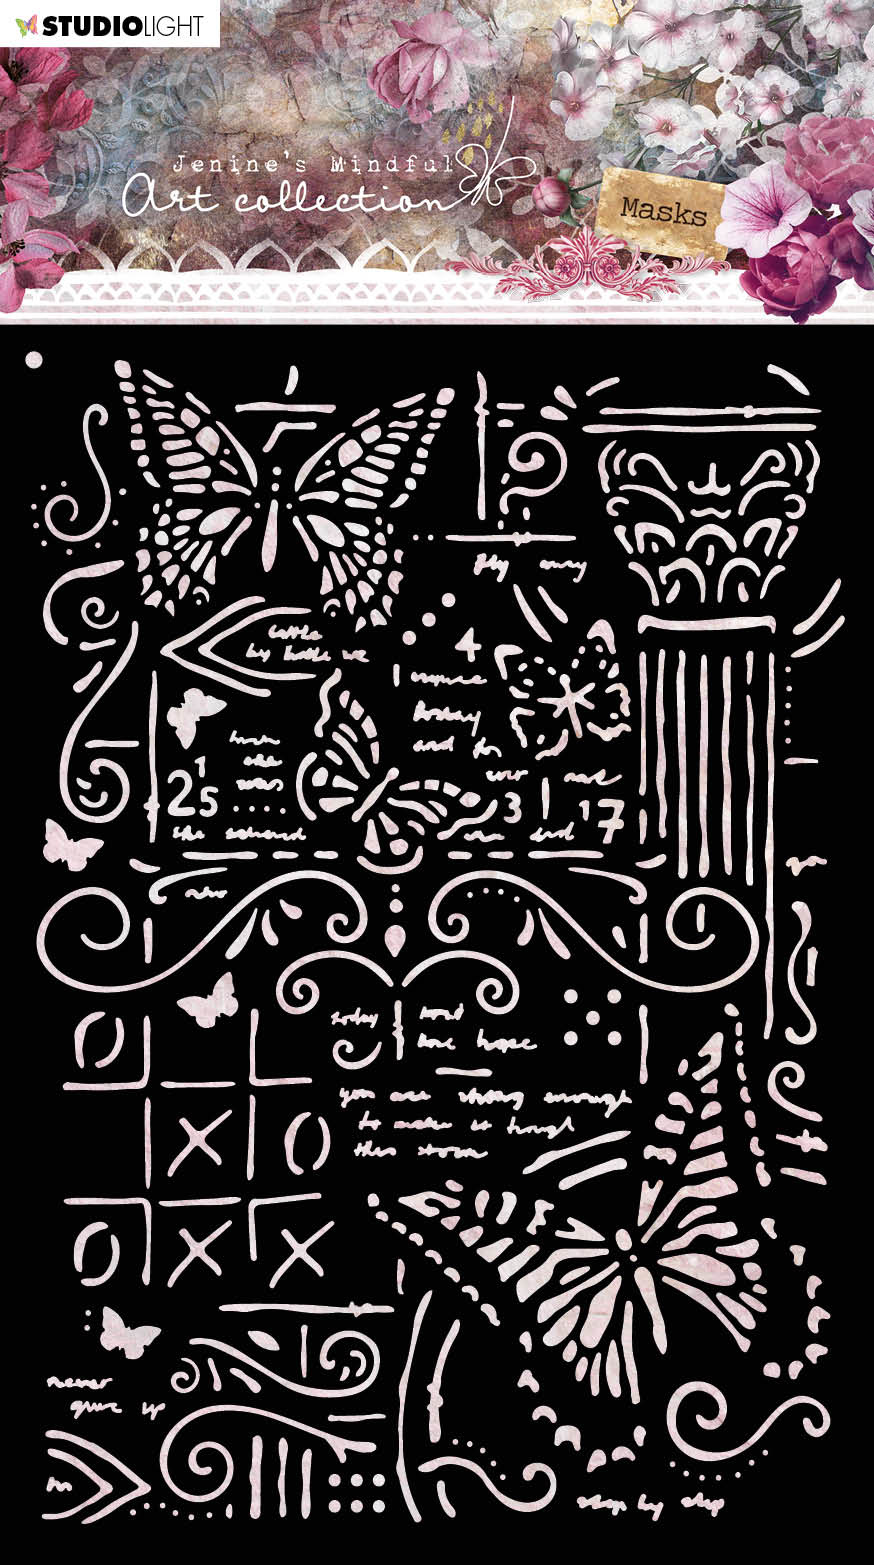 Studiolight Mask Stencil (1) A5 Jenine's Mindful Art 3.0 nr.06